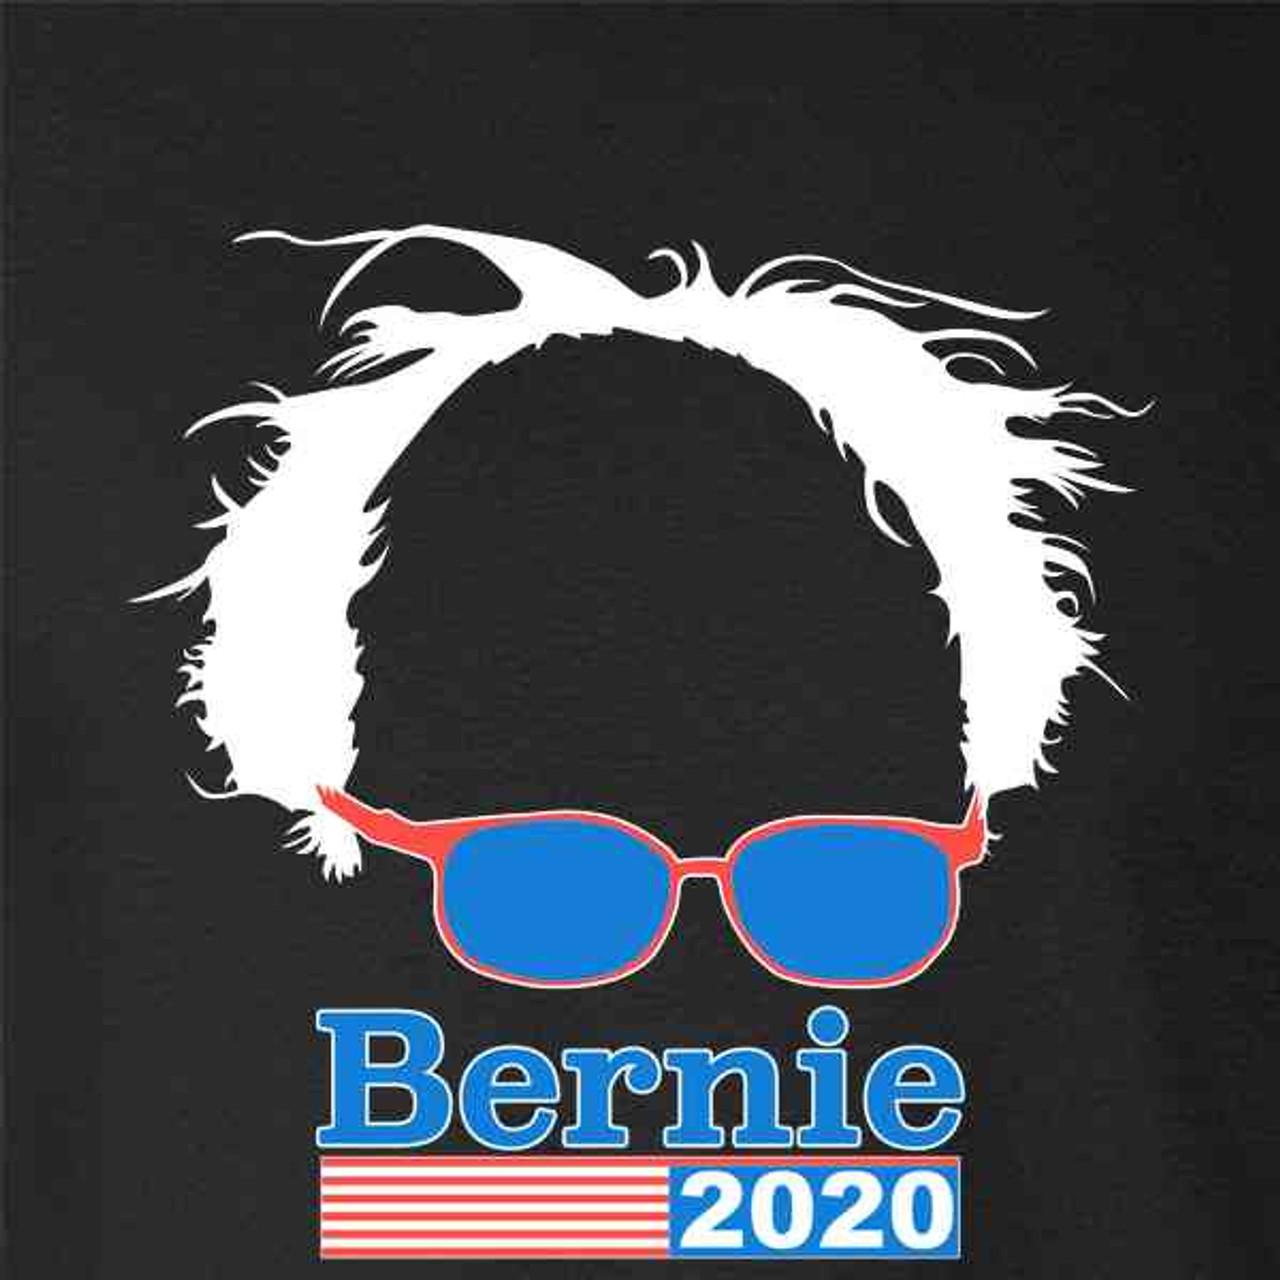 d14c11ae4ee627 Bernie Sanders 2020 Hair and Glasses Campaign - Pop Threads